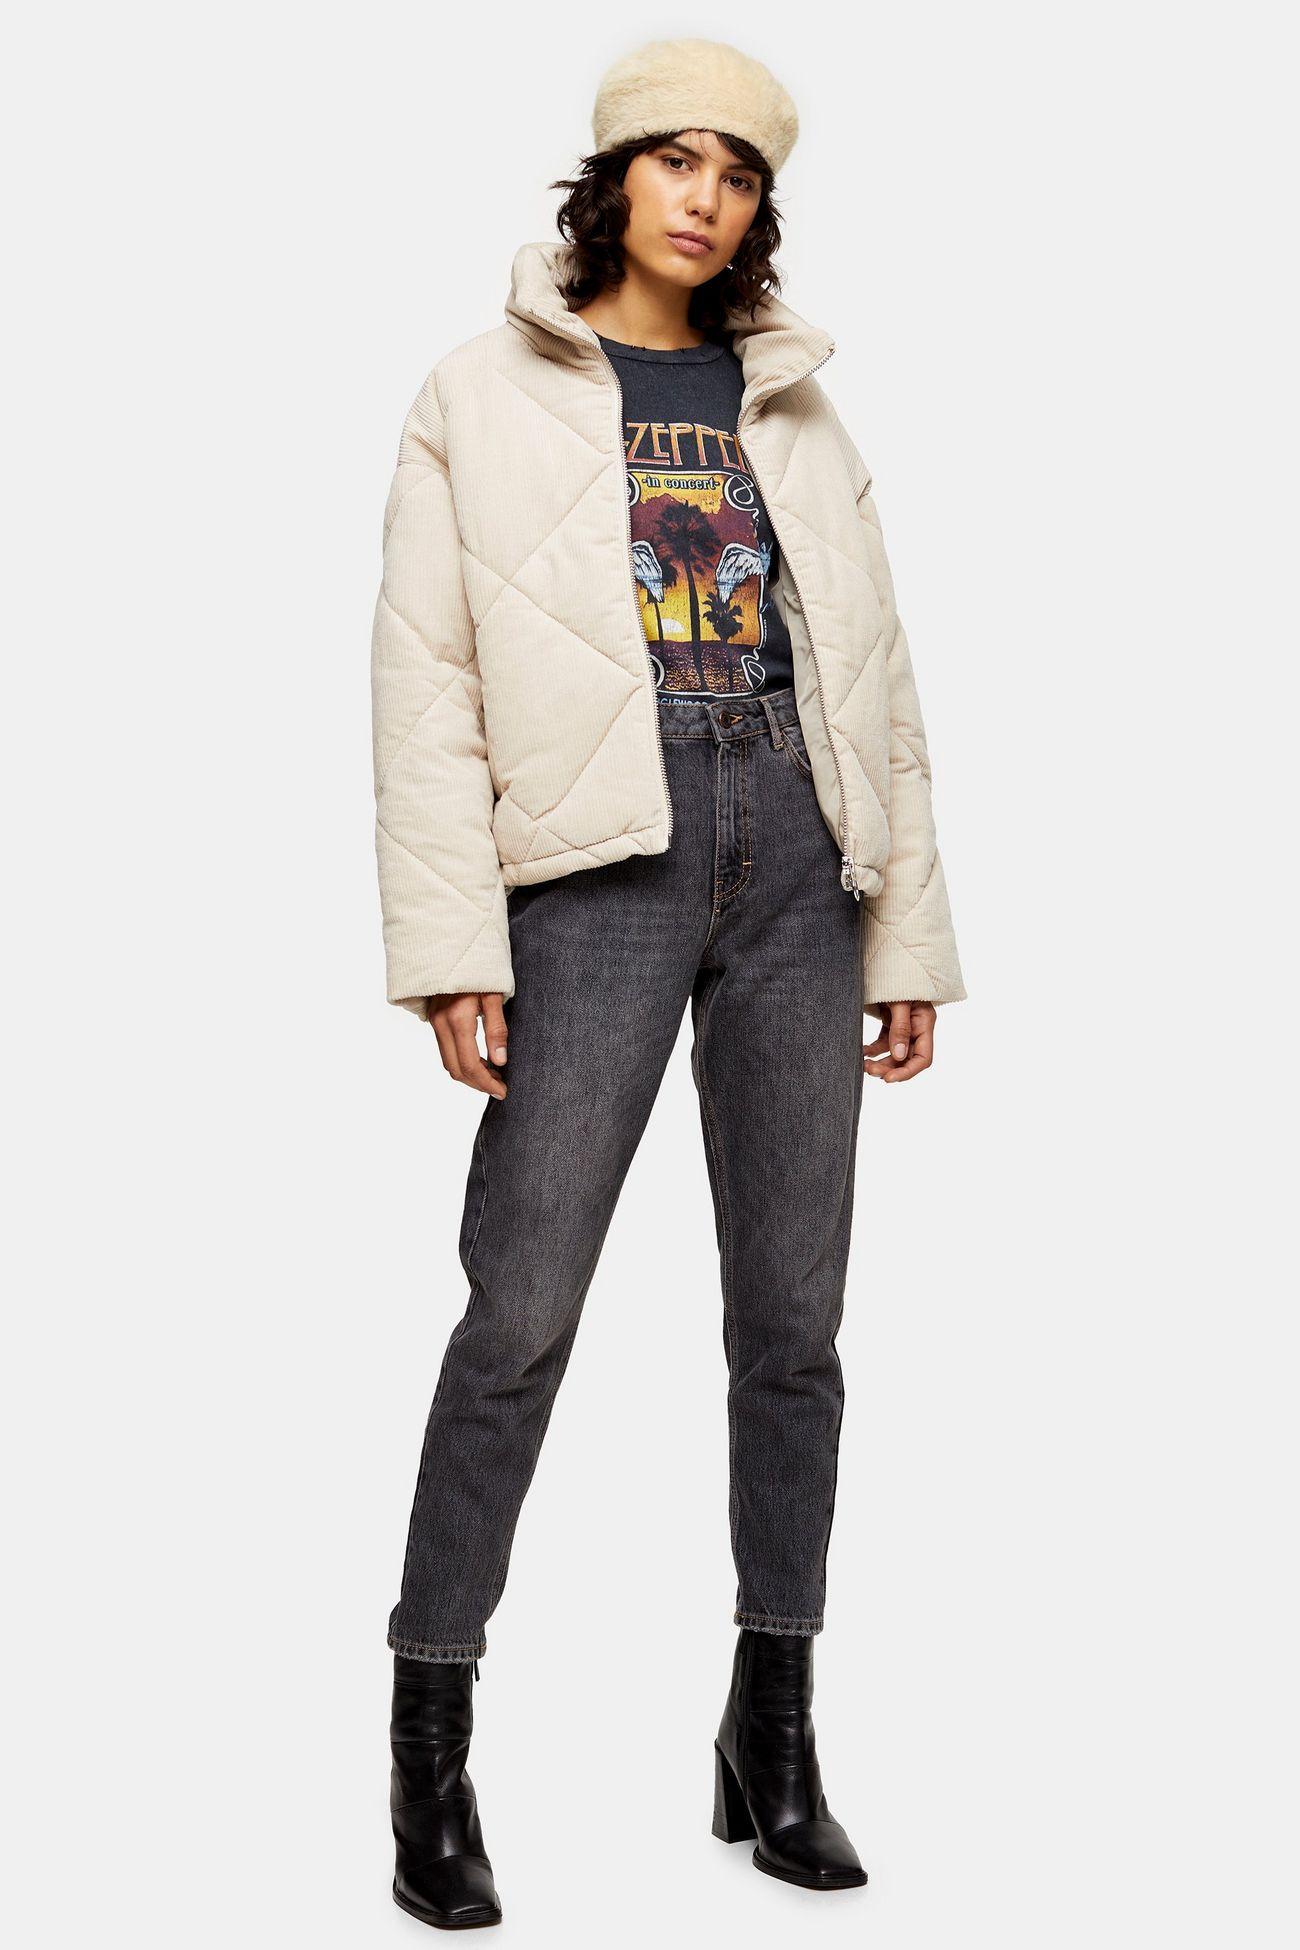 Ecru Corduroy Puffer Jacket | Puffer jackets, Jeans outfit ...